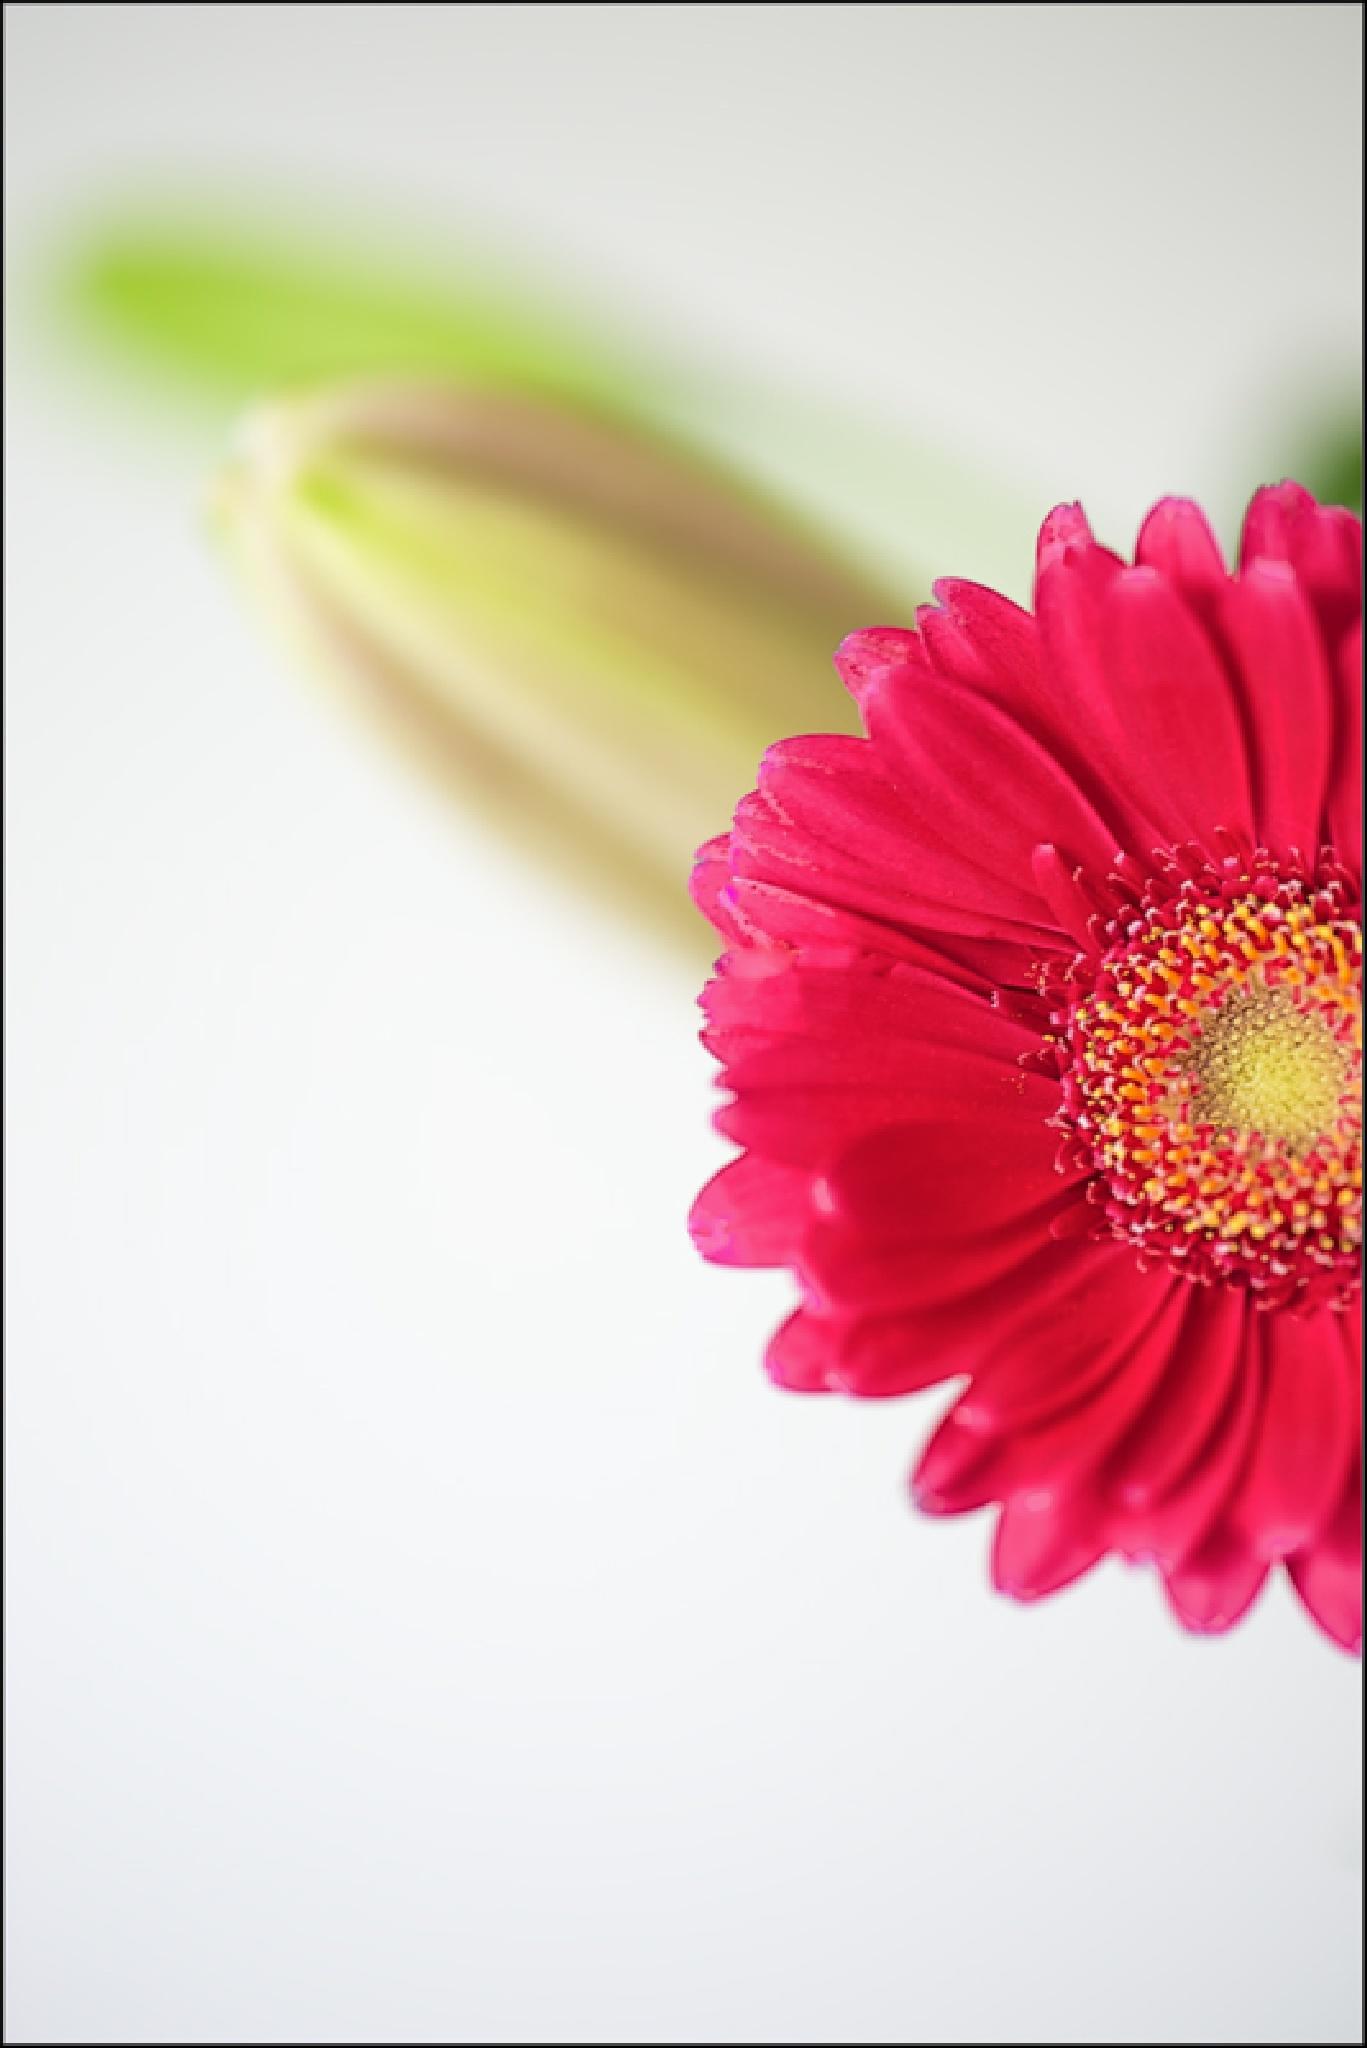 Flower ... by FrankLockwood